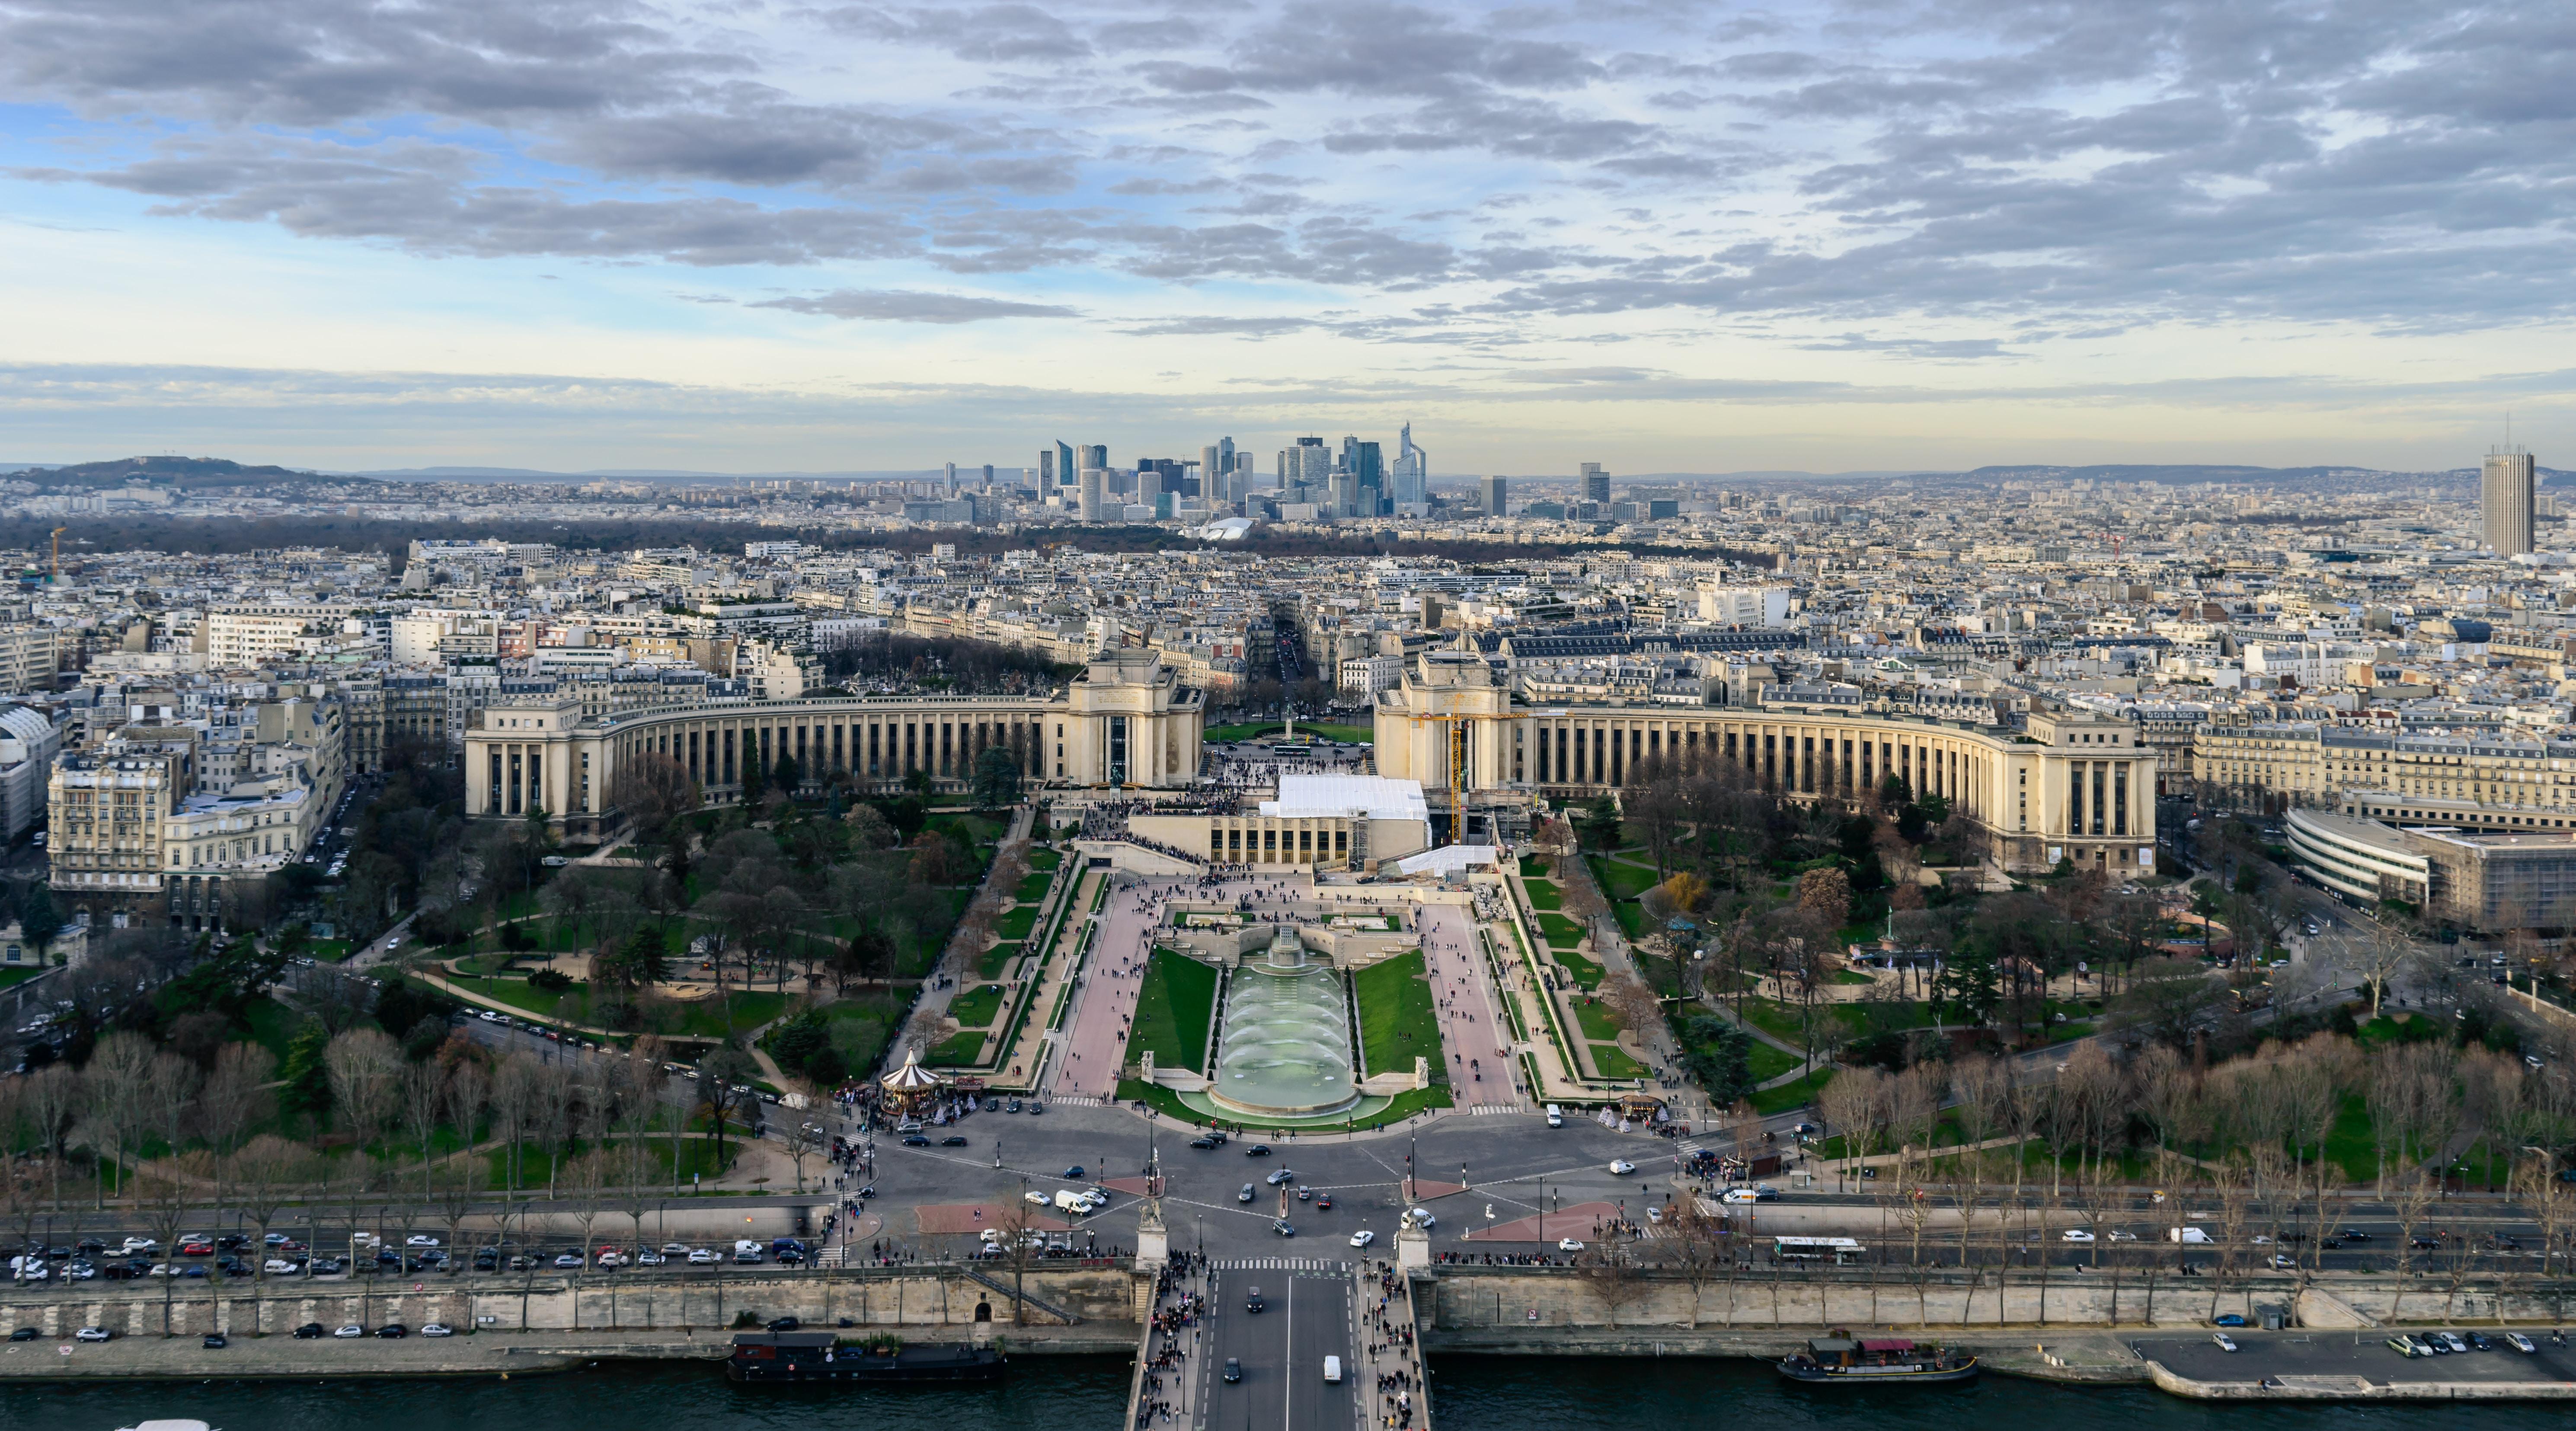 "Paris by <a href=""https://unsplash.com/@chriskaridis"">Chris Karidis</a>"